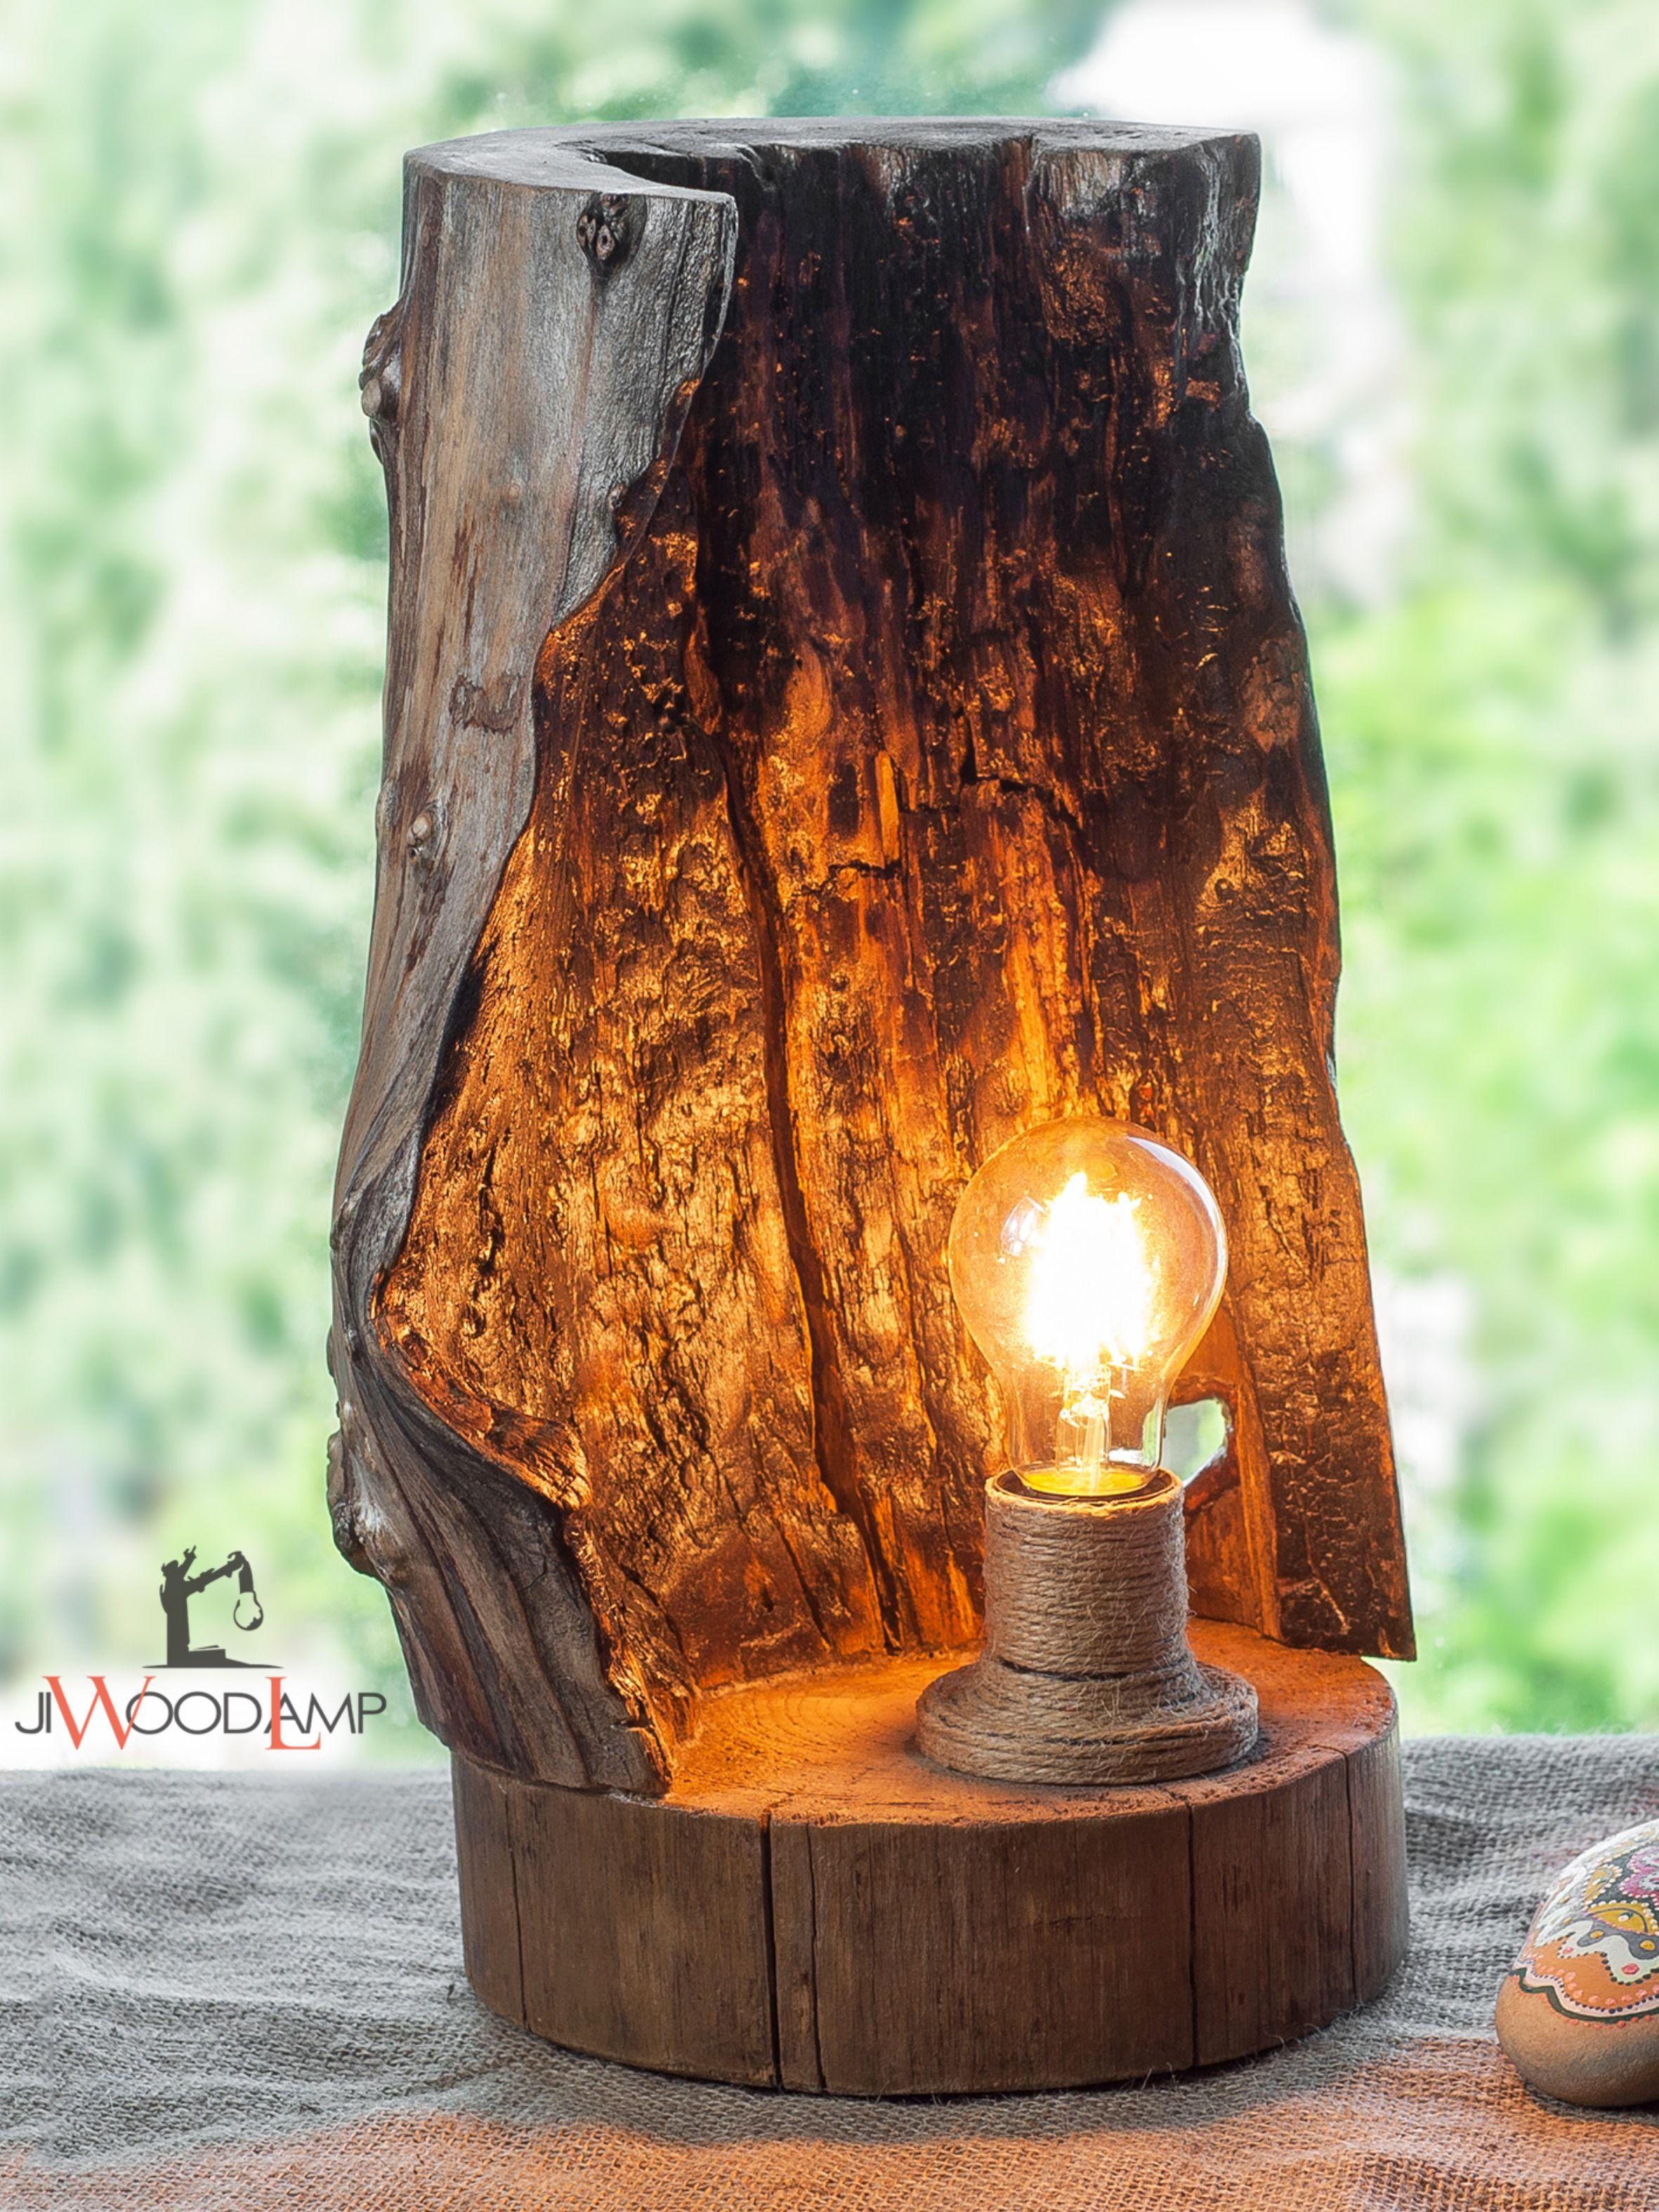 Wood Lamp Driftwood Lamp Rustic Light Burned Wood Lamp Rustic